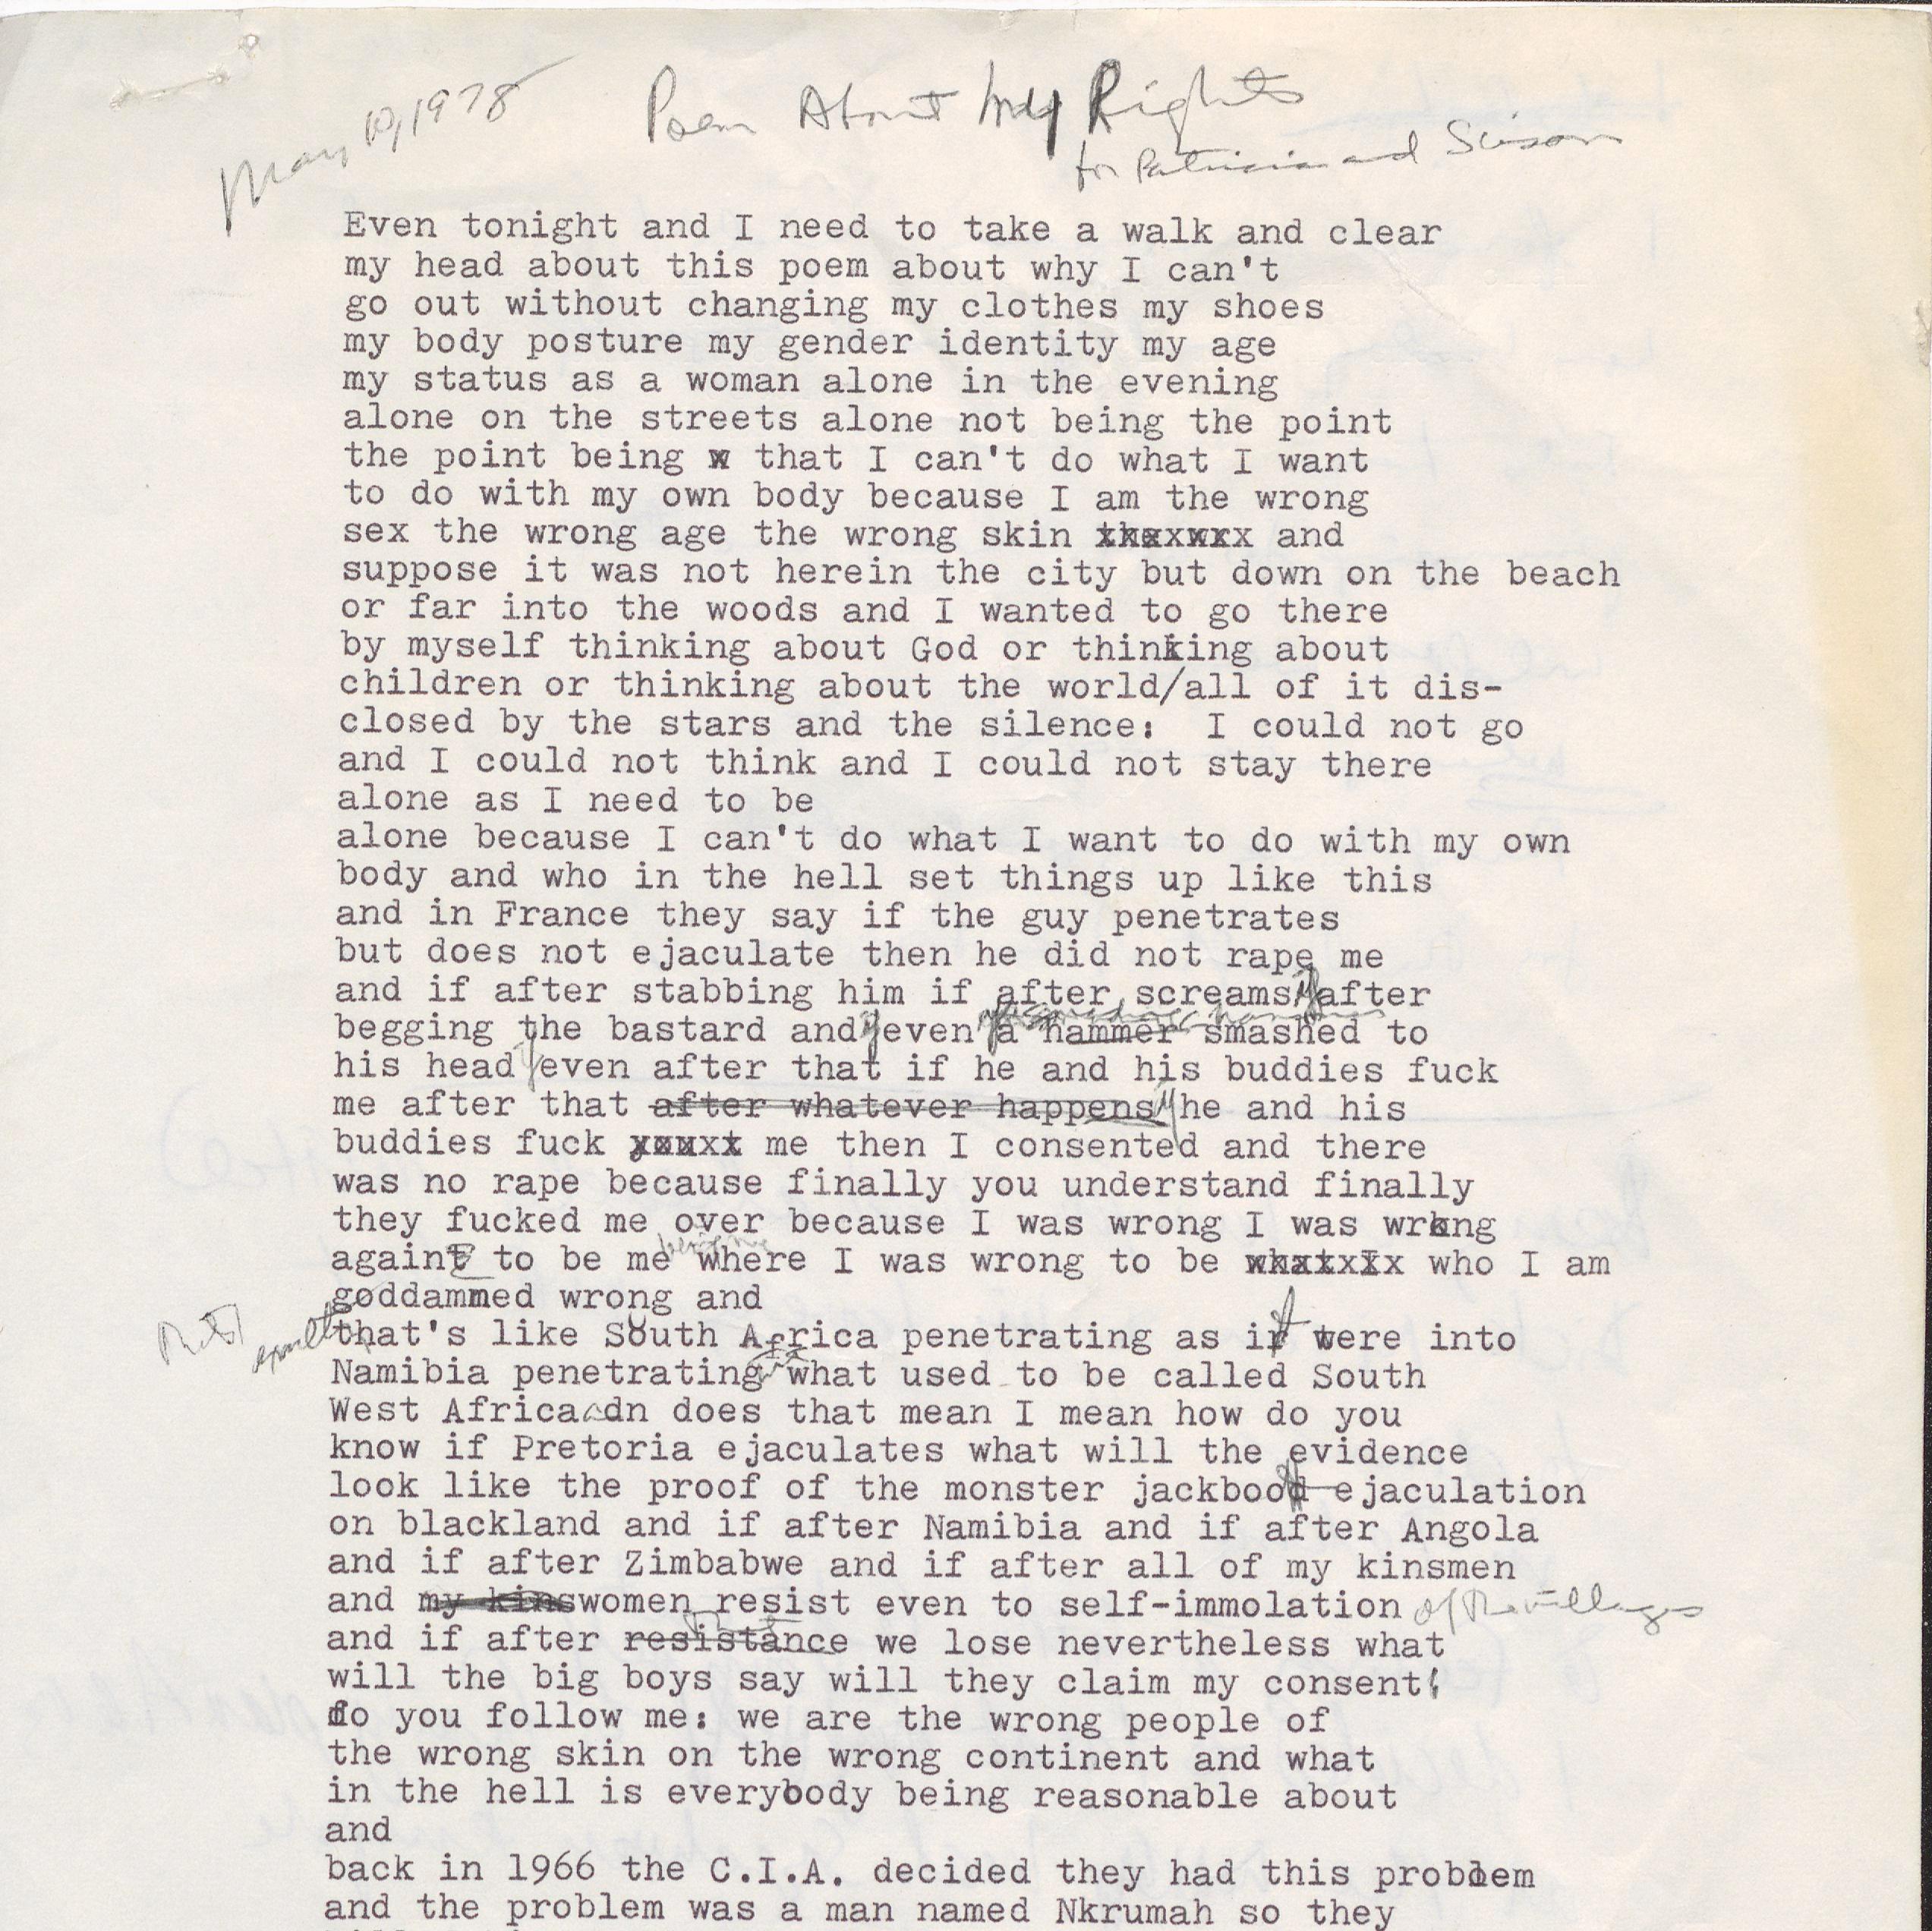 Annotated poem by June Jordan